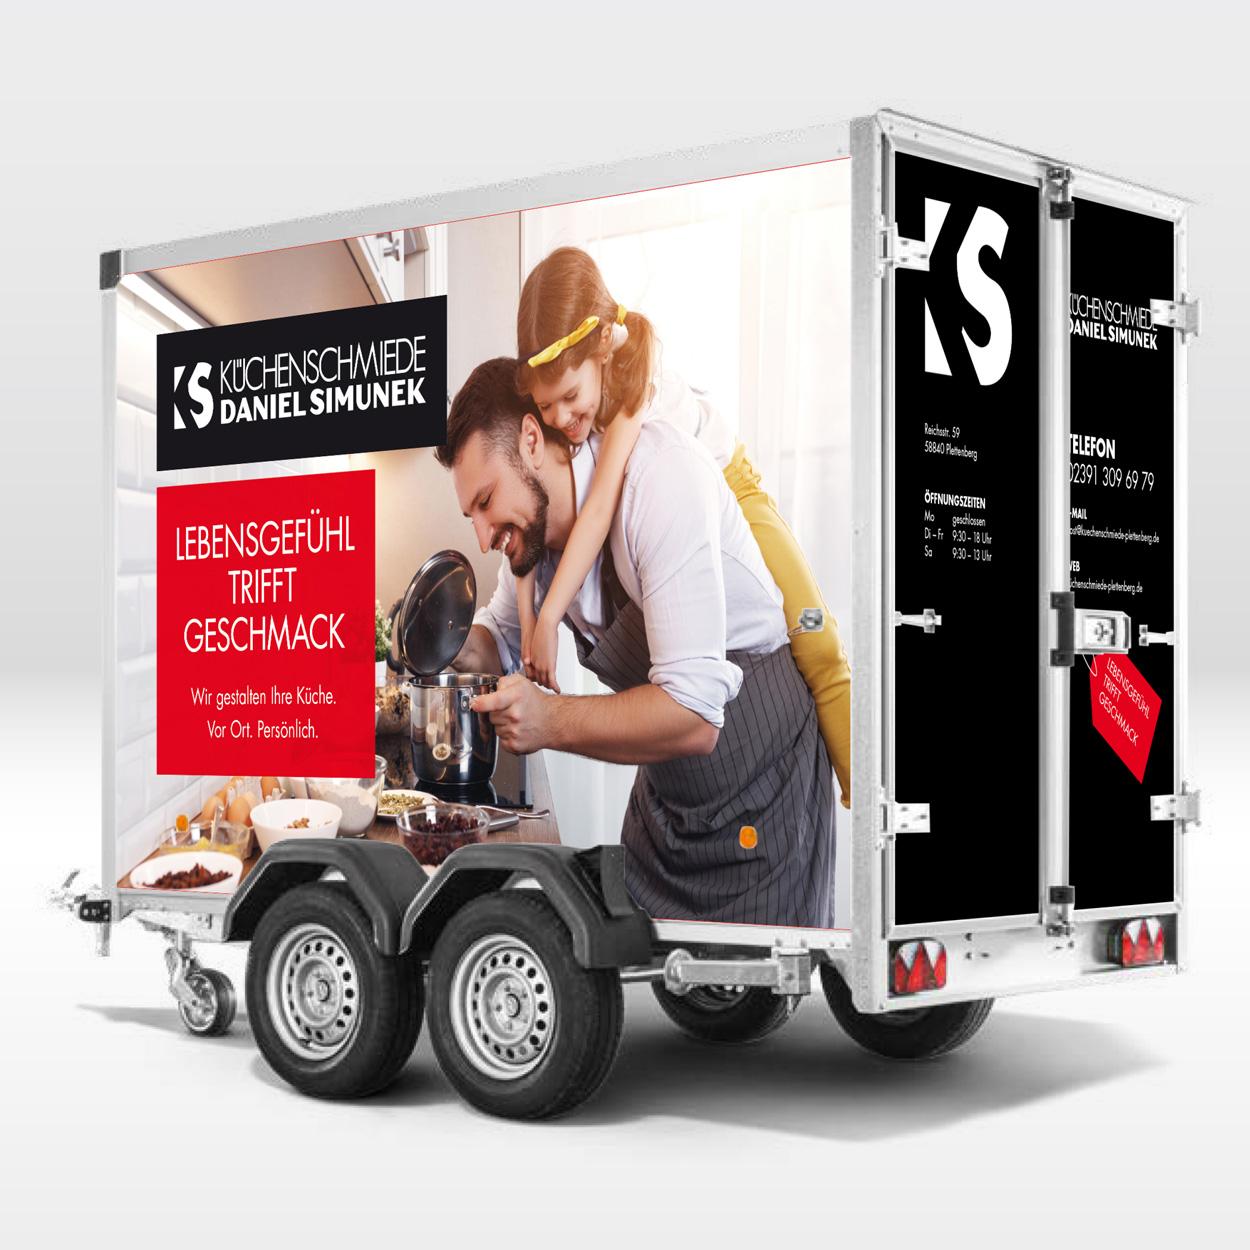 Kuechenschmiede TWINNERS Zwillingsagentur Werbeagentur Designagentur Design Werbung Konzept Emsbüren Plettenberg